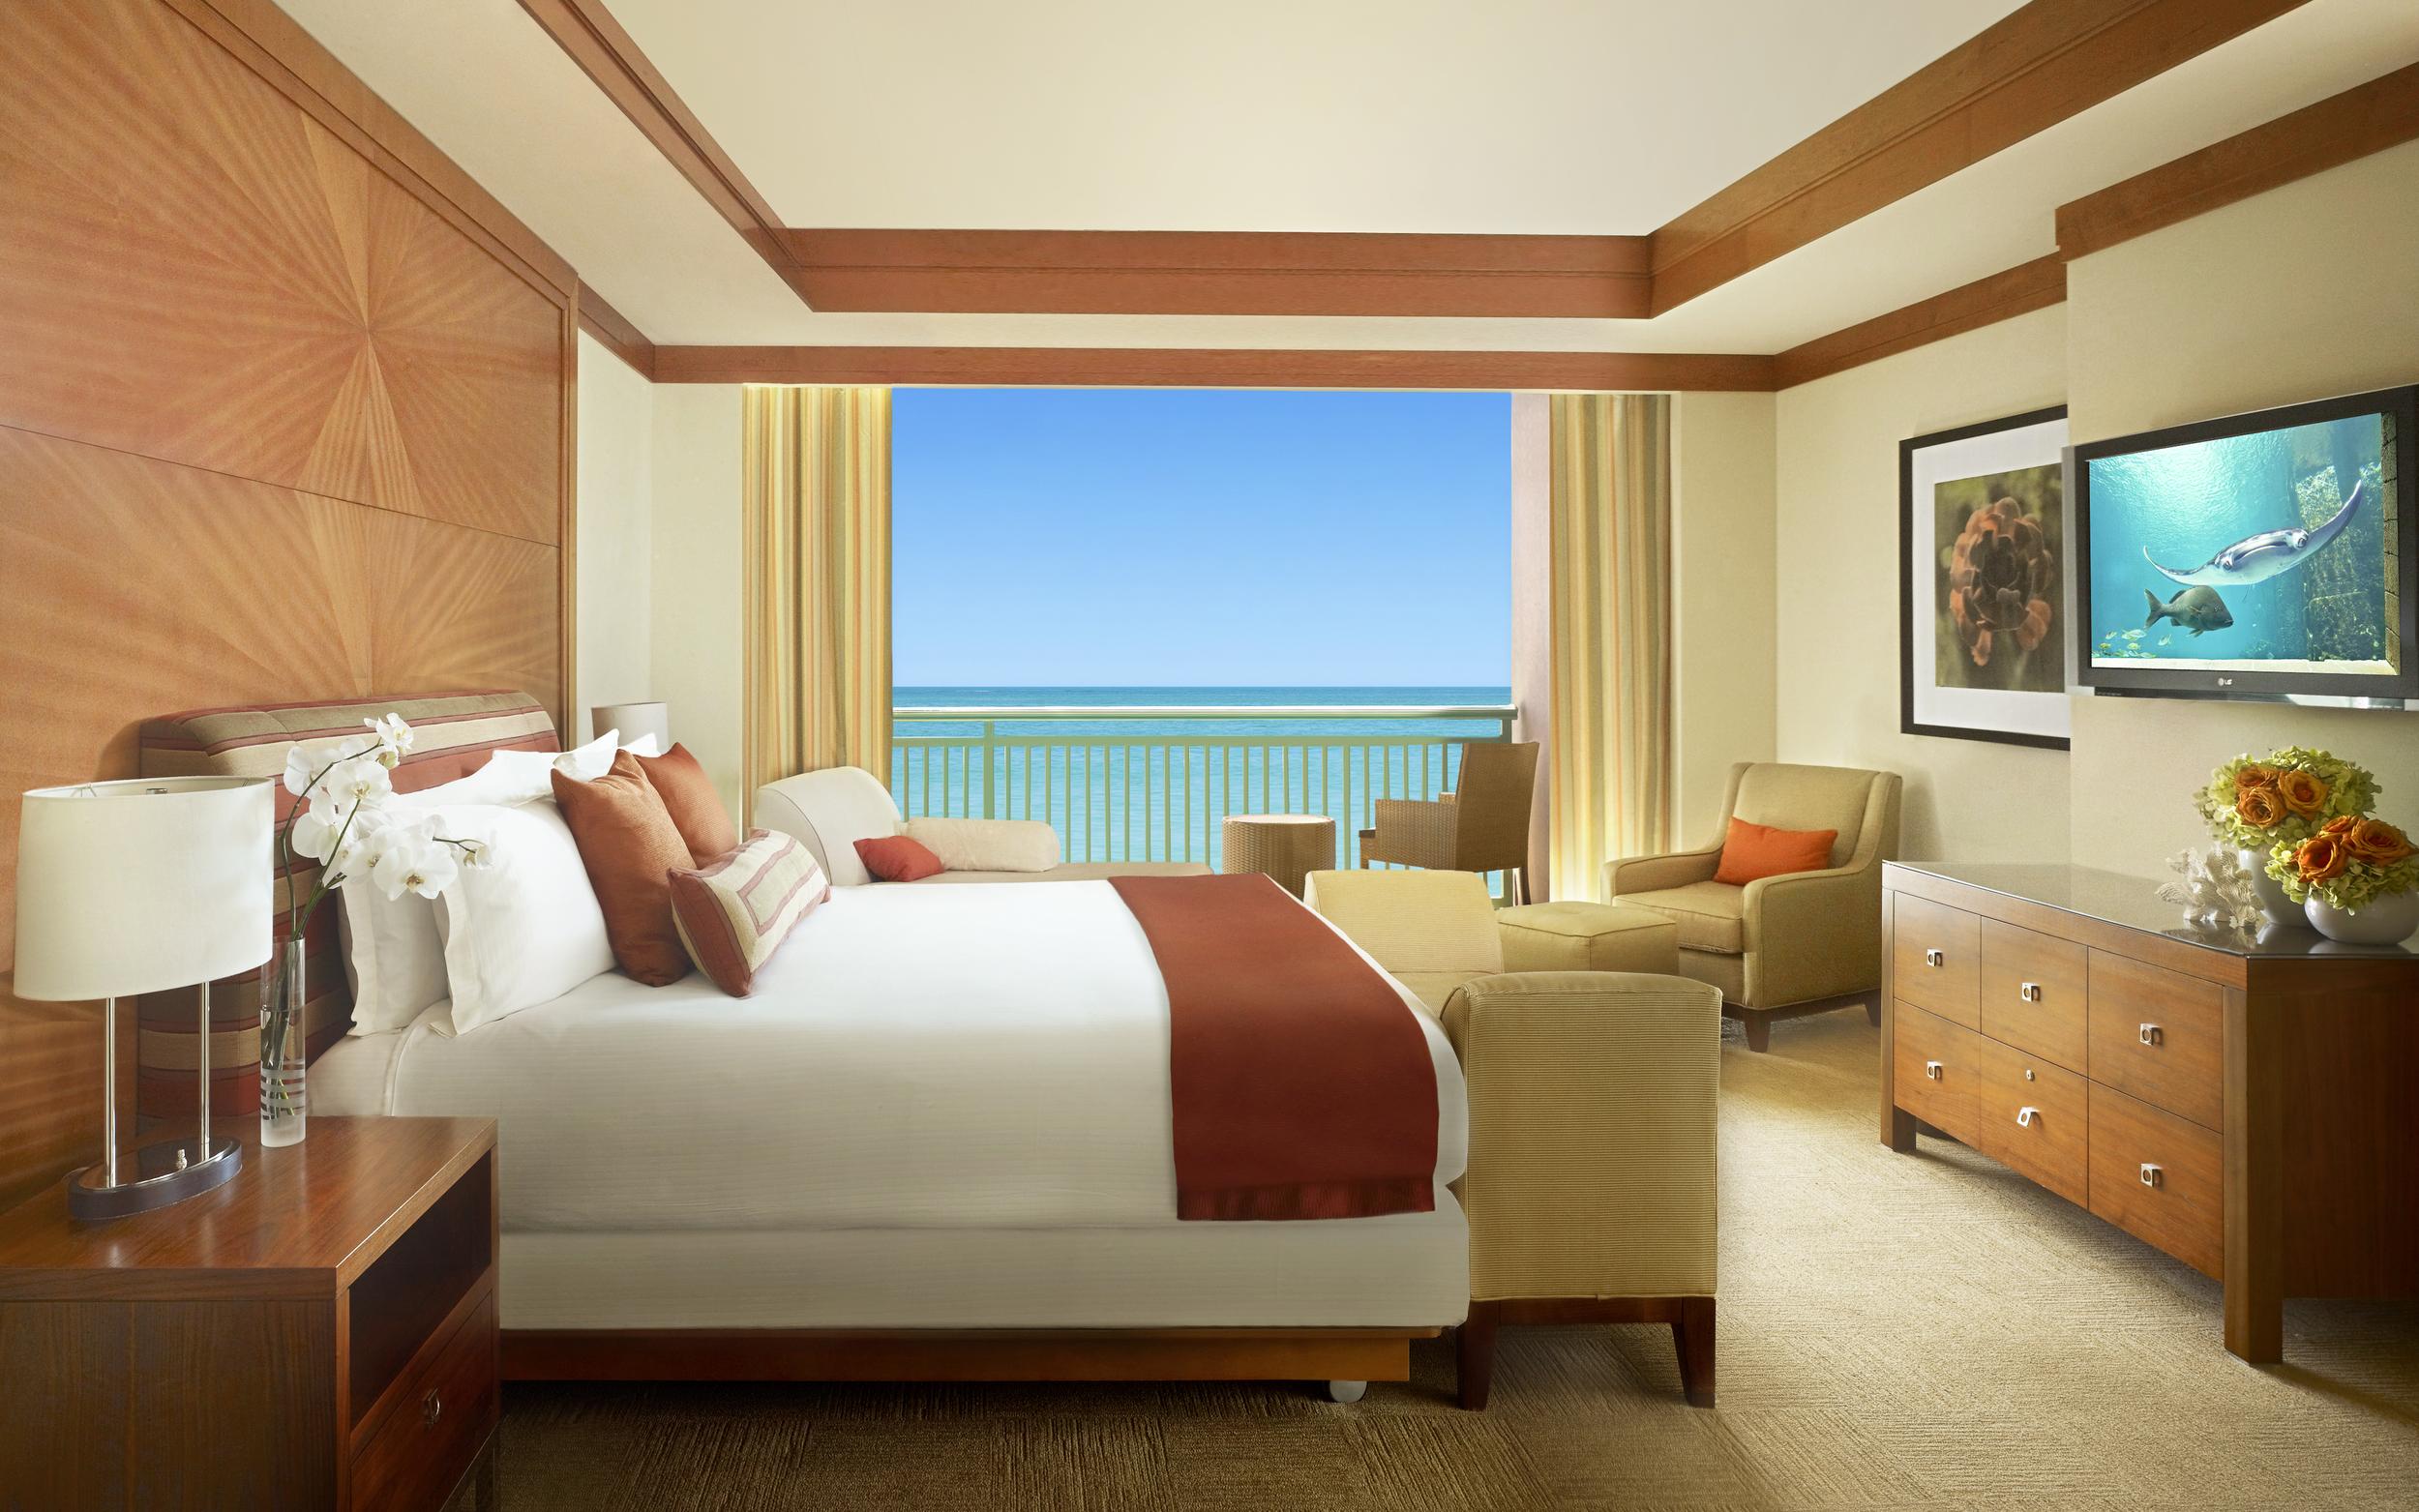 The_Cove_Atlantis_Azure_Suite_-_Bedroom_12270_standard.jpg